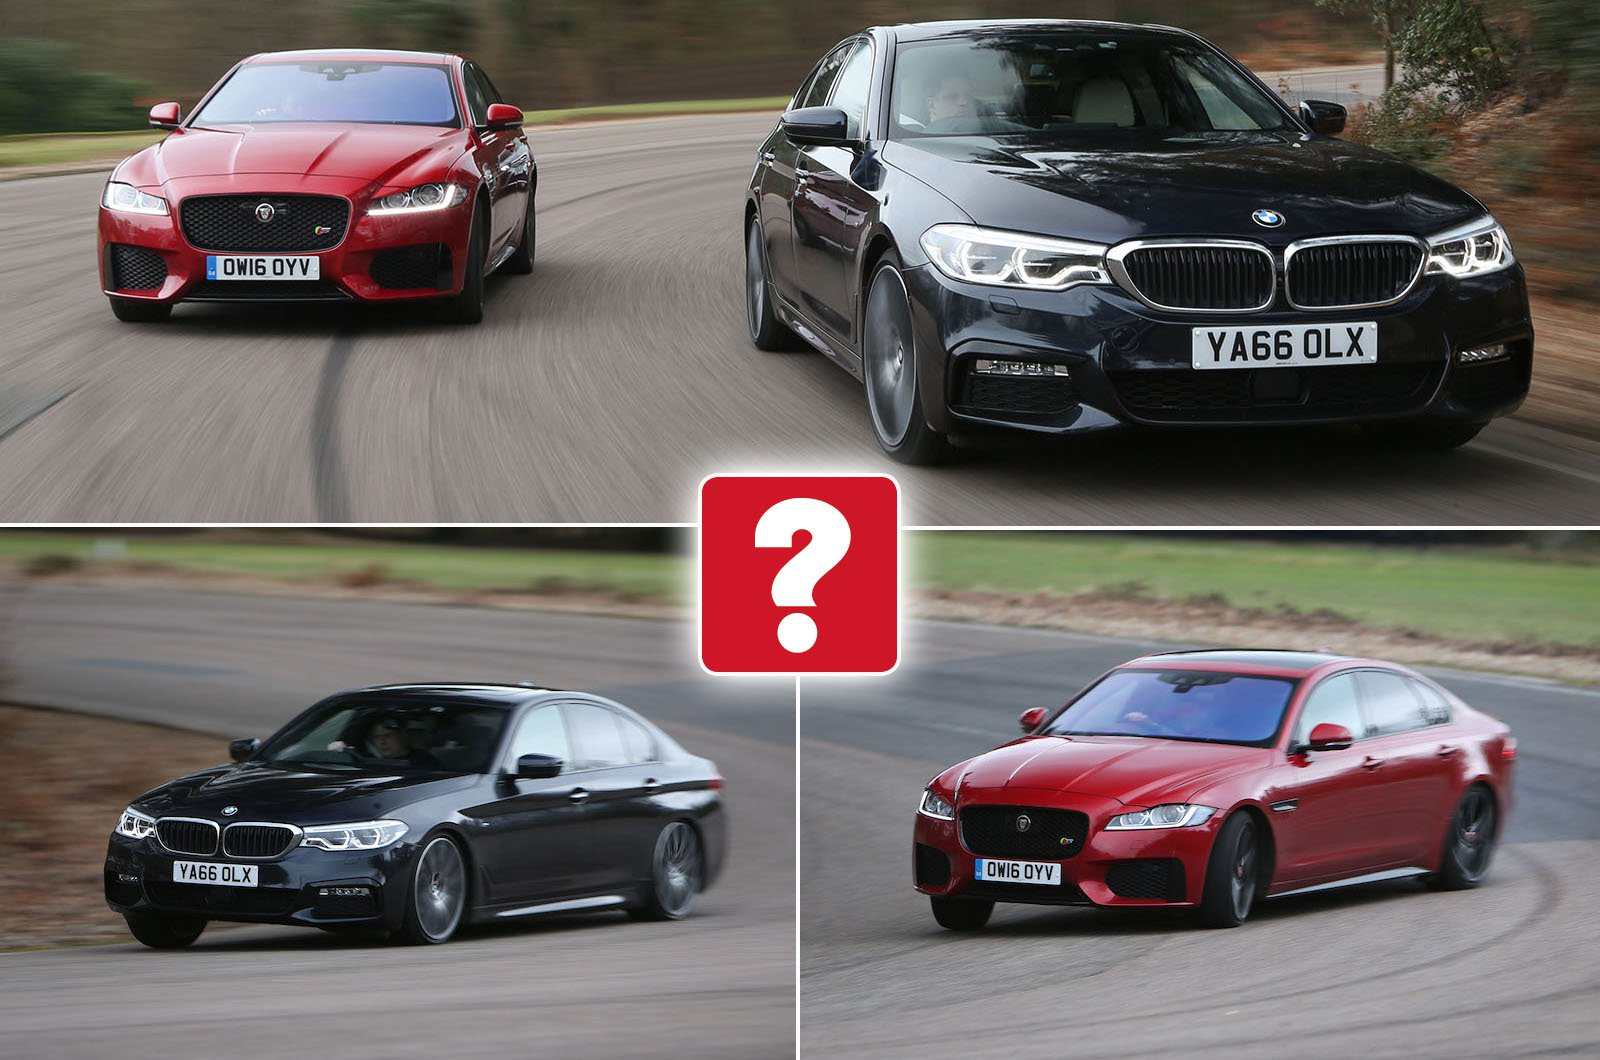 Used test: BMW 5 Series vs Jaguar XF